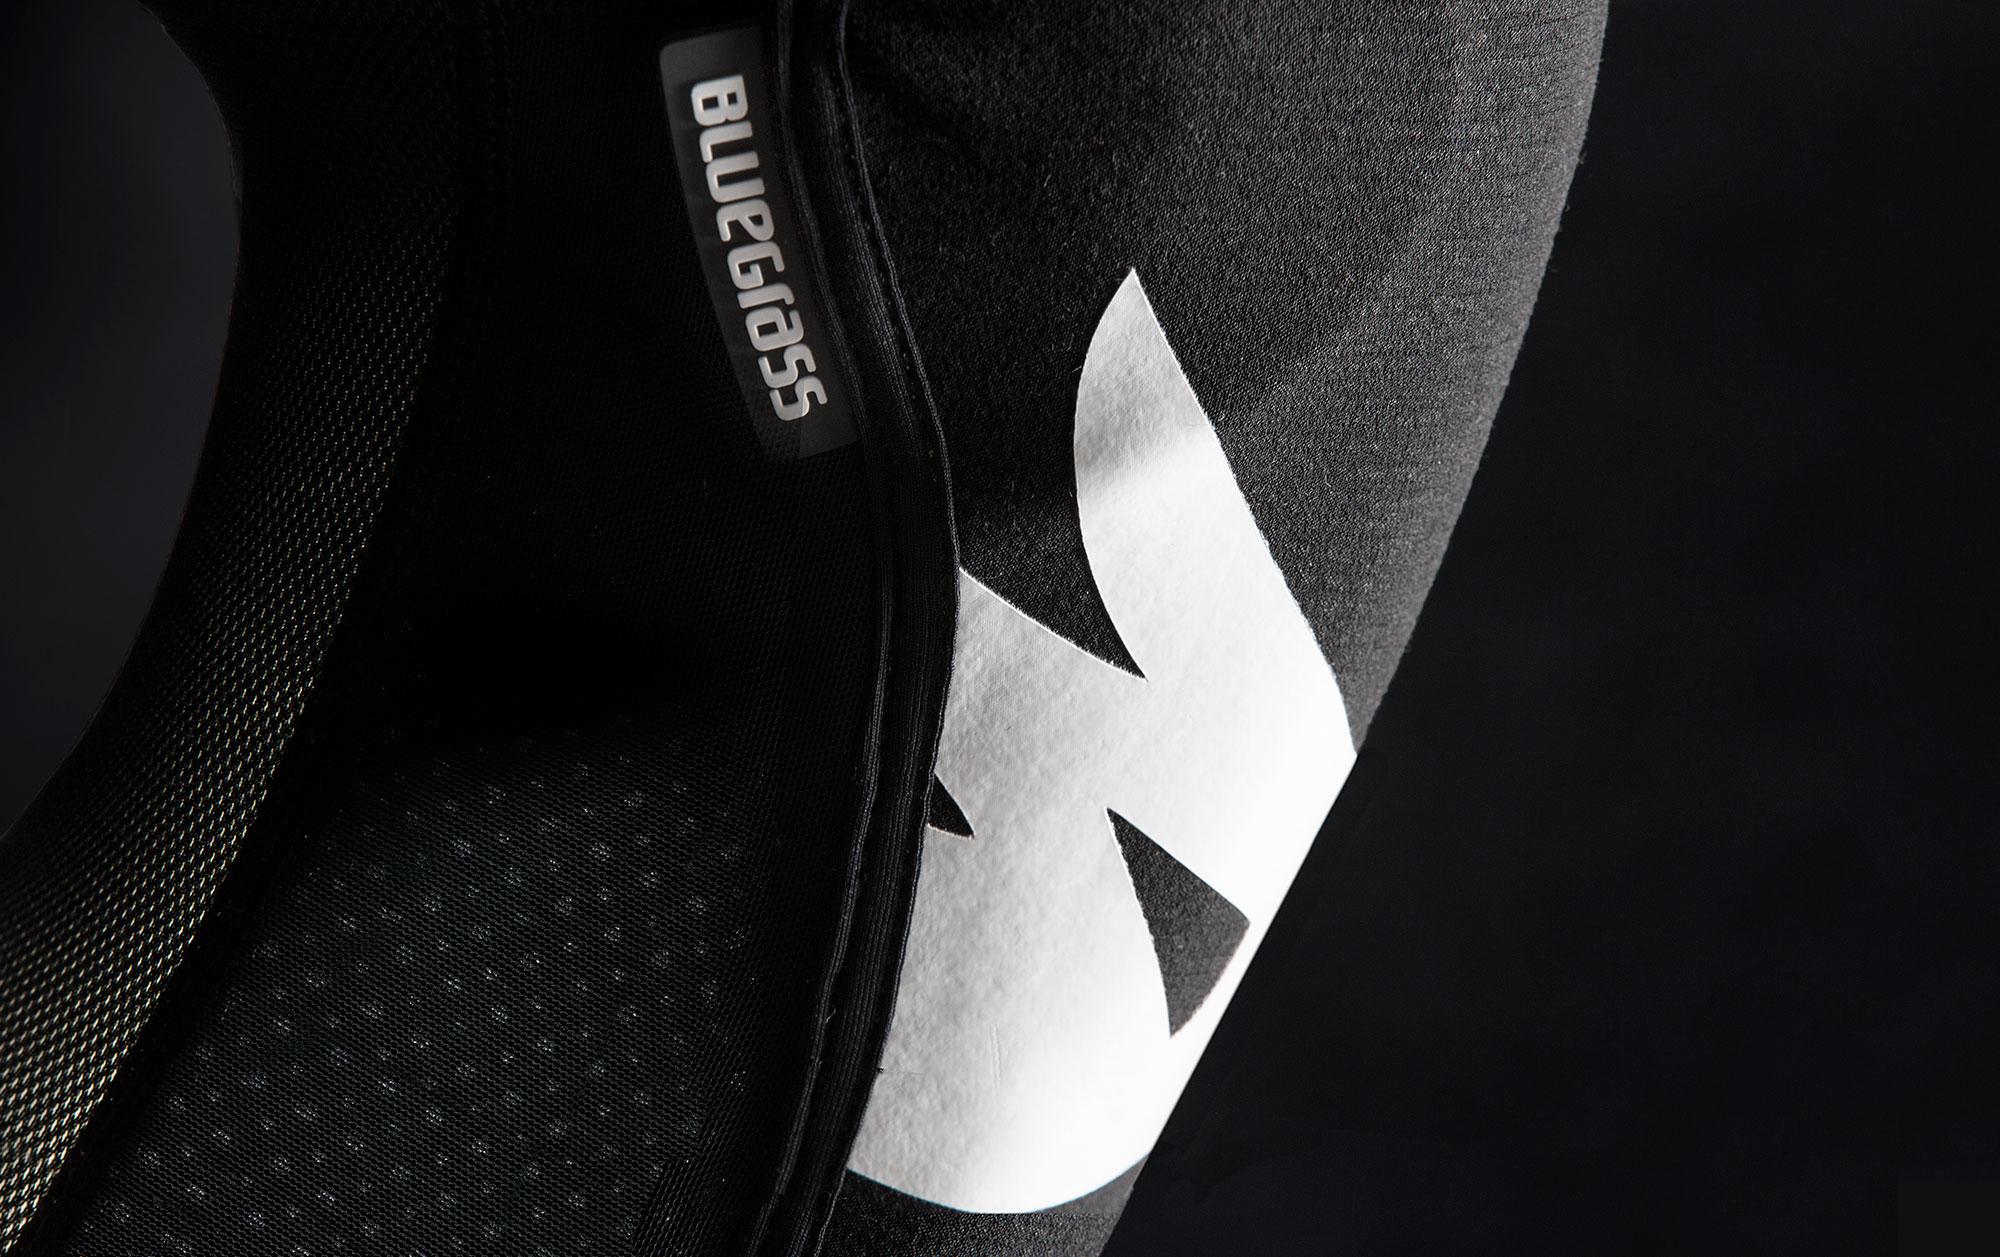 BLUEGRASS Skinny D3O Protection made for Mountain Bike, Enduro and E-Bike